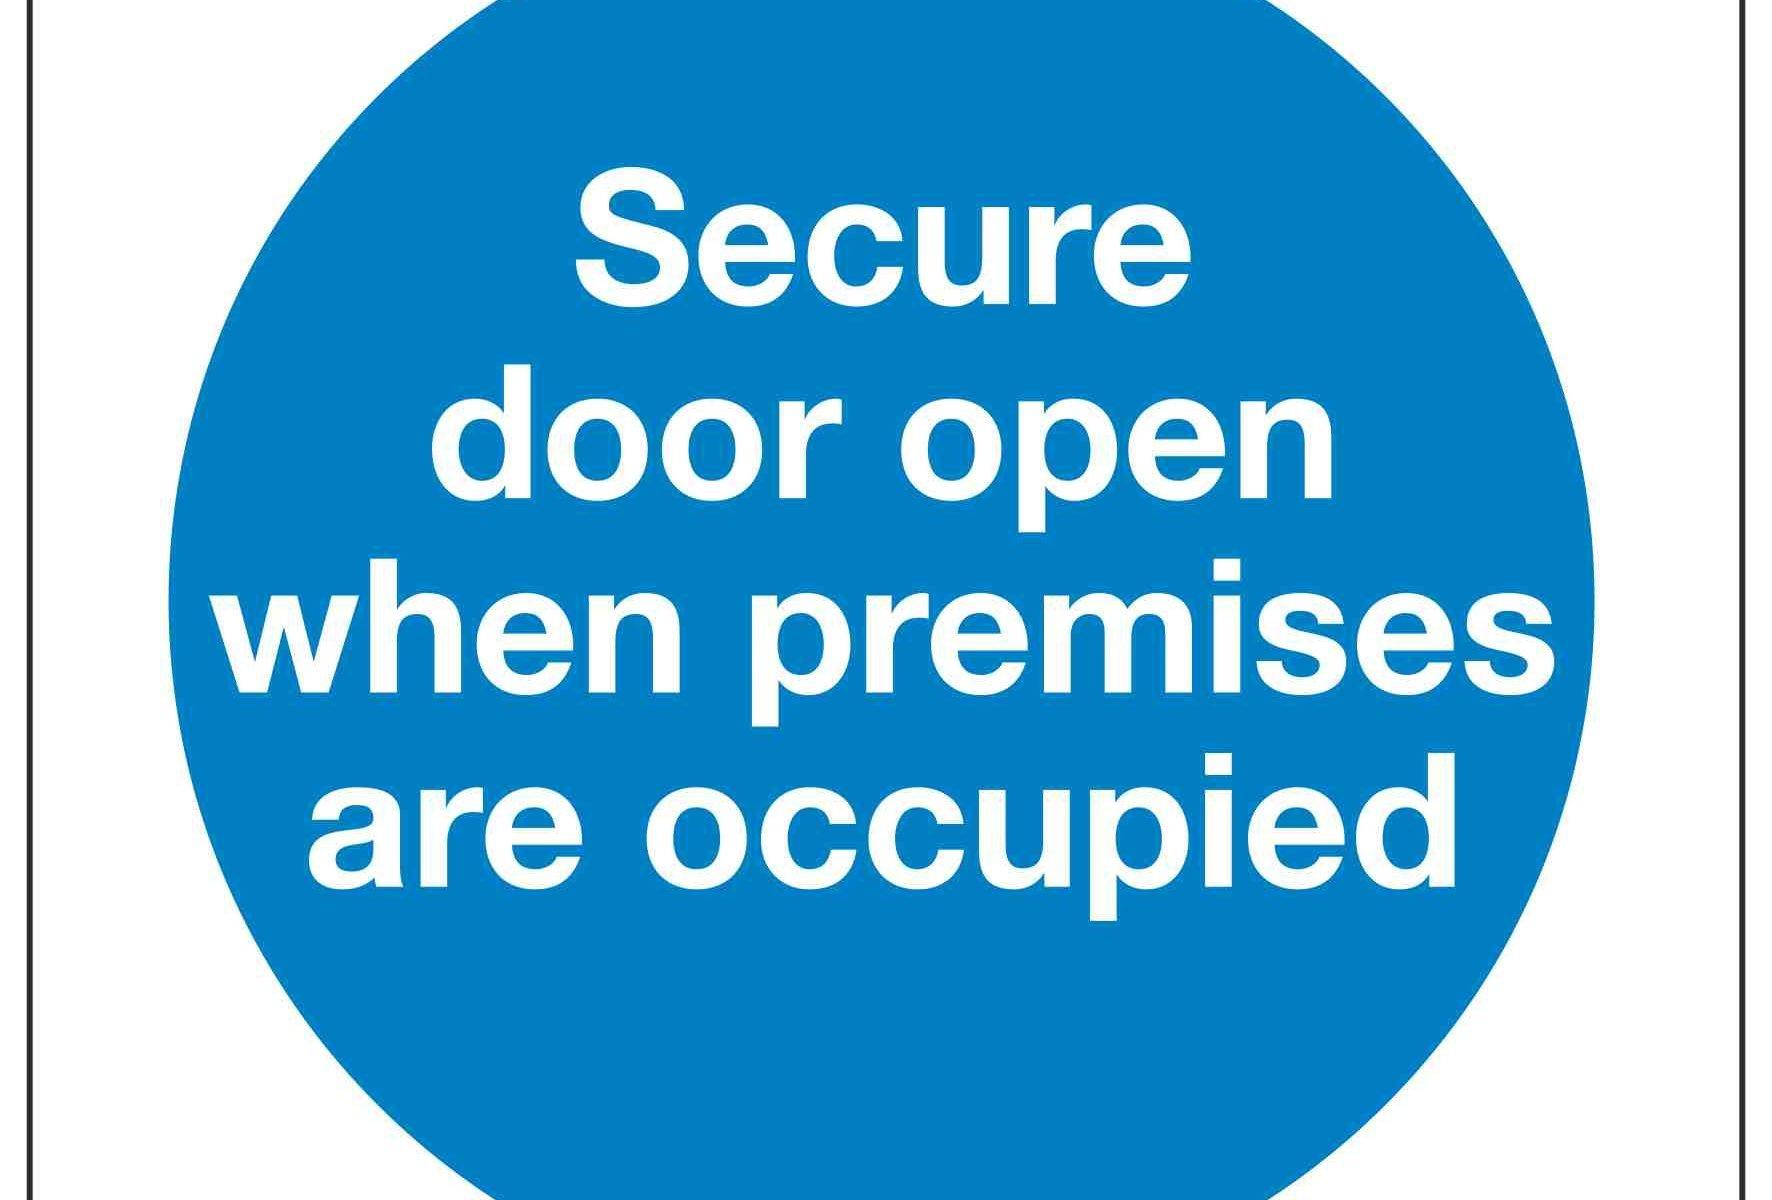 Secure door open when premises are occupied